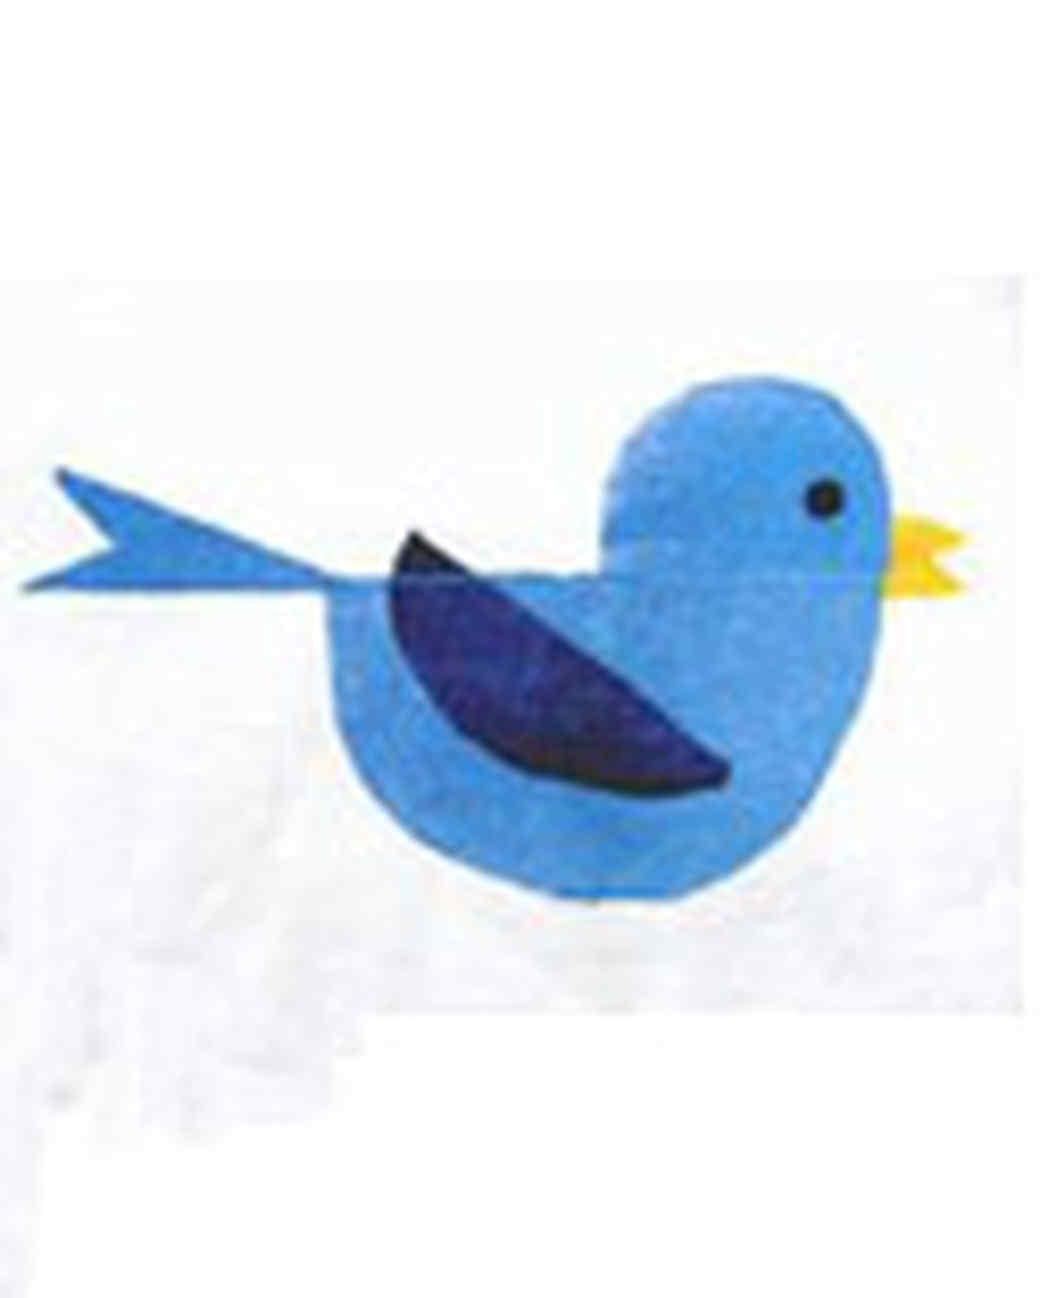 3016_092707_bluebird.jpg